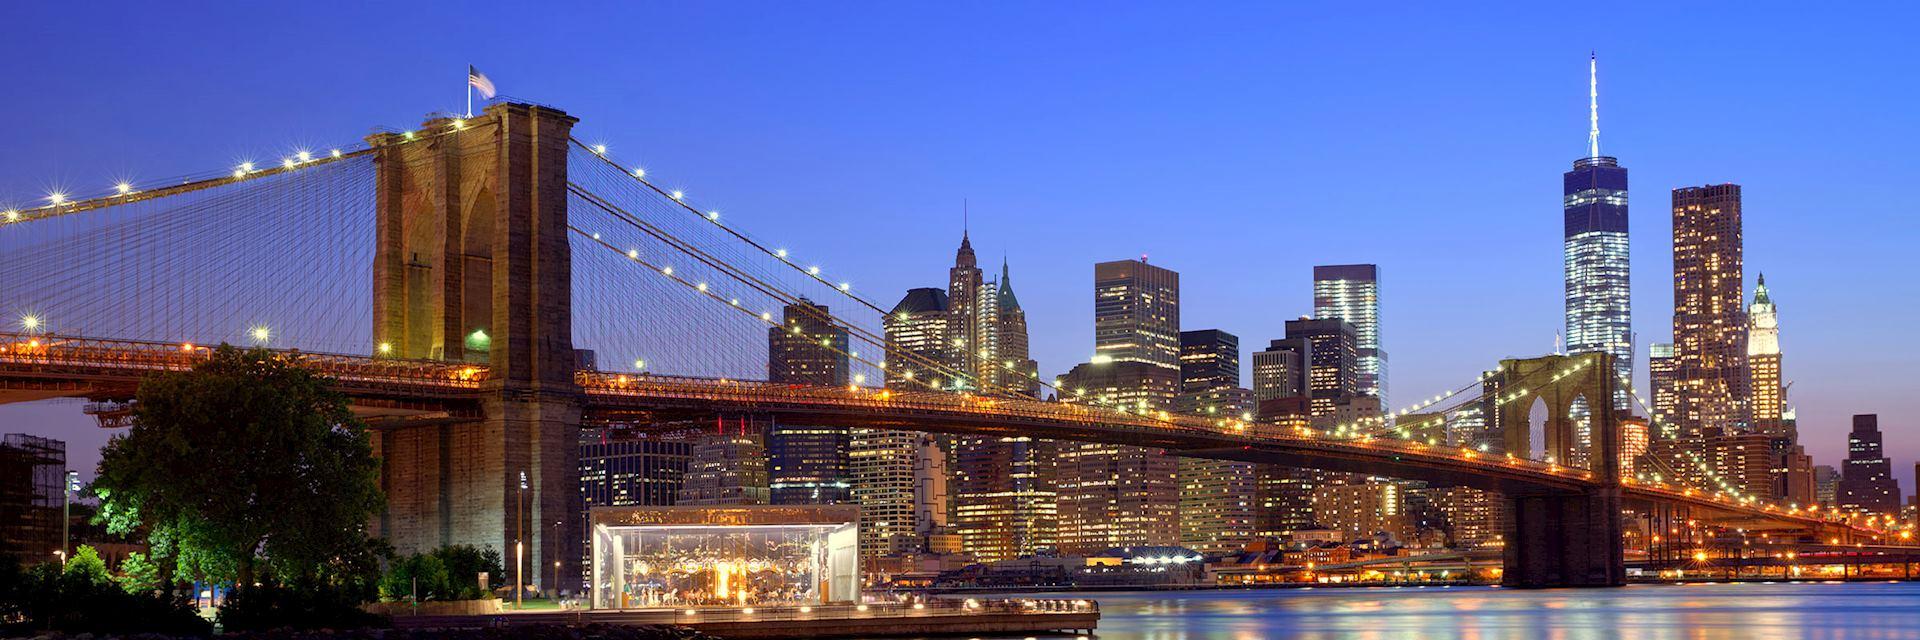 Brooklyn Bridge at sunset, New York